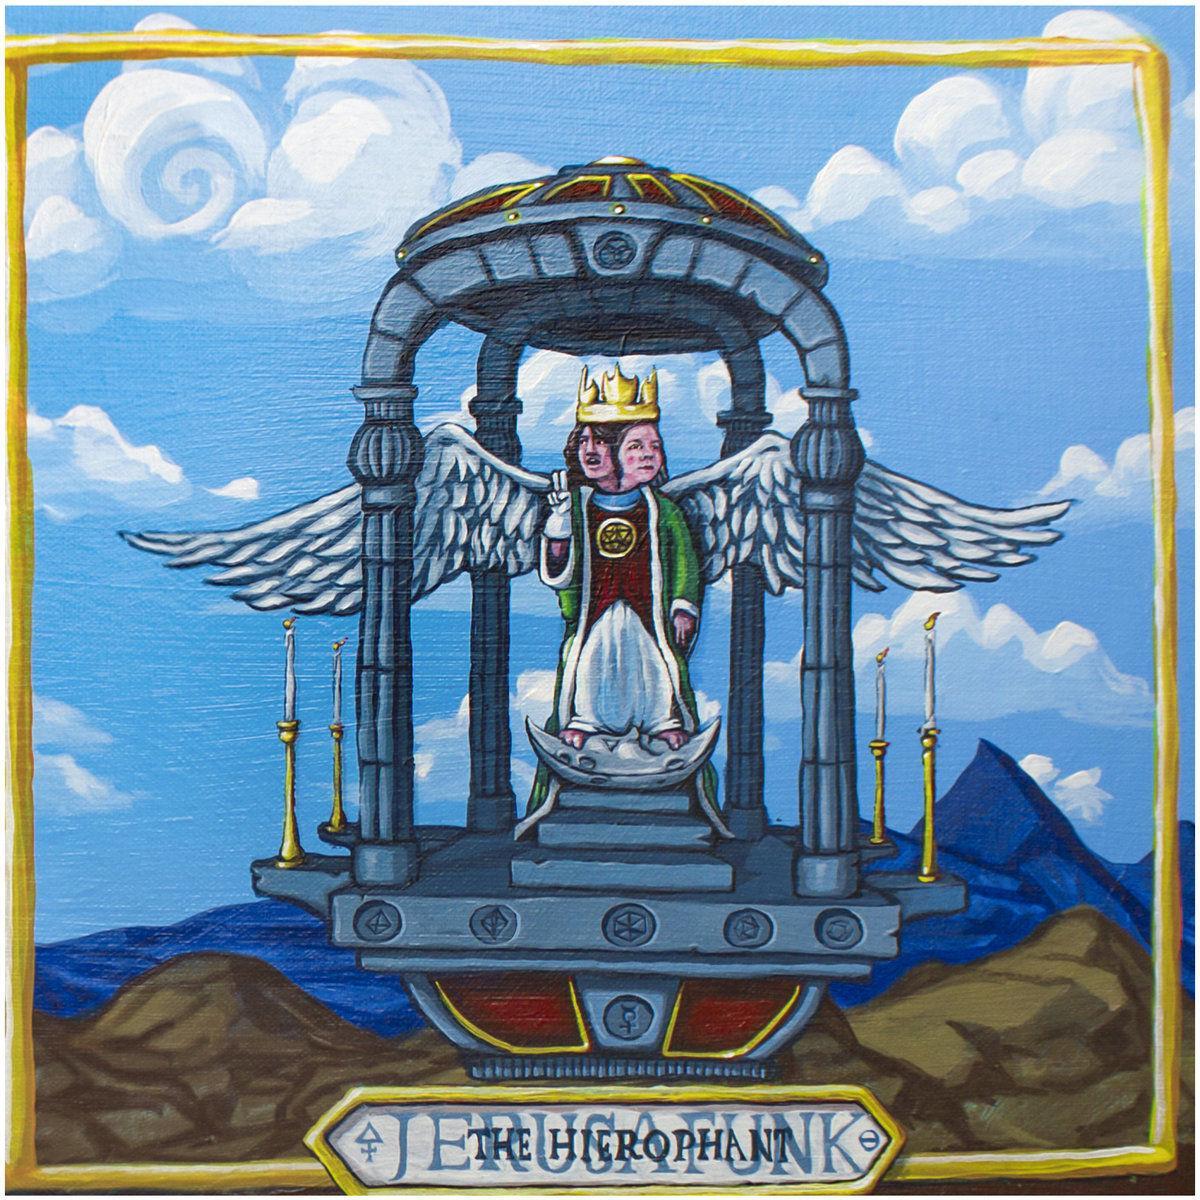 Jerusafunk - The Hierophant